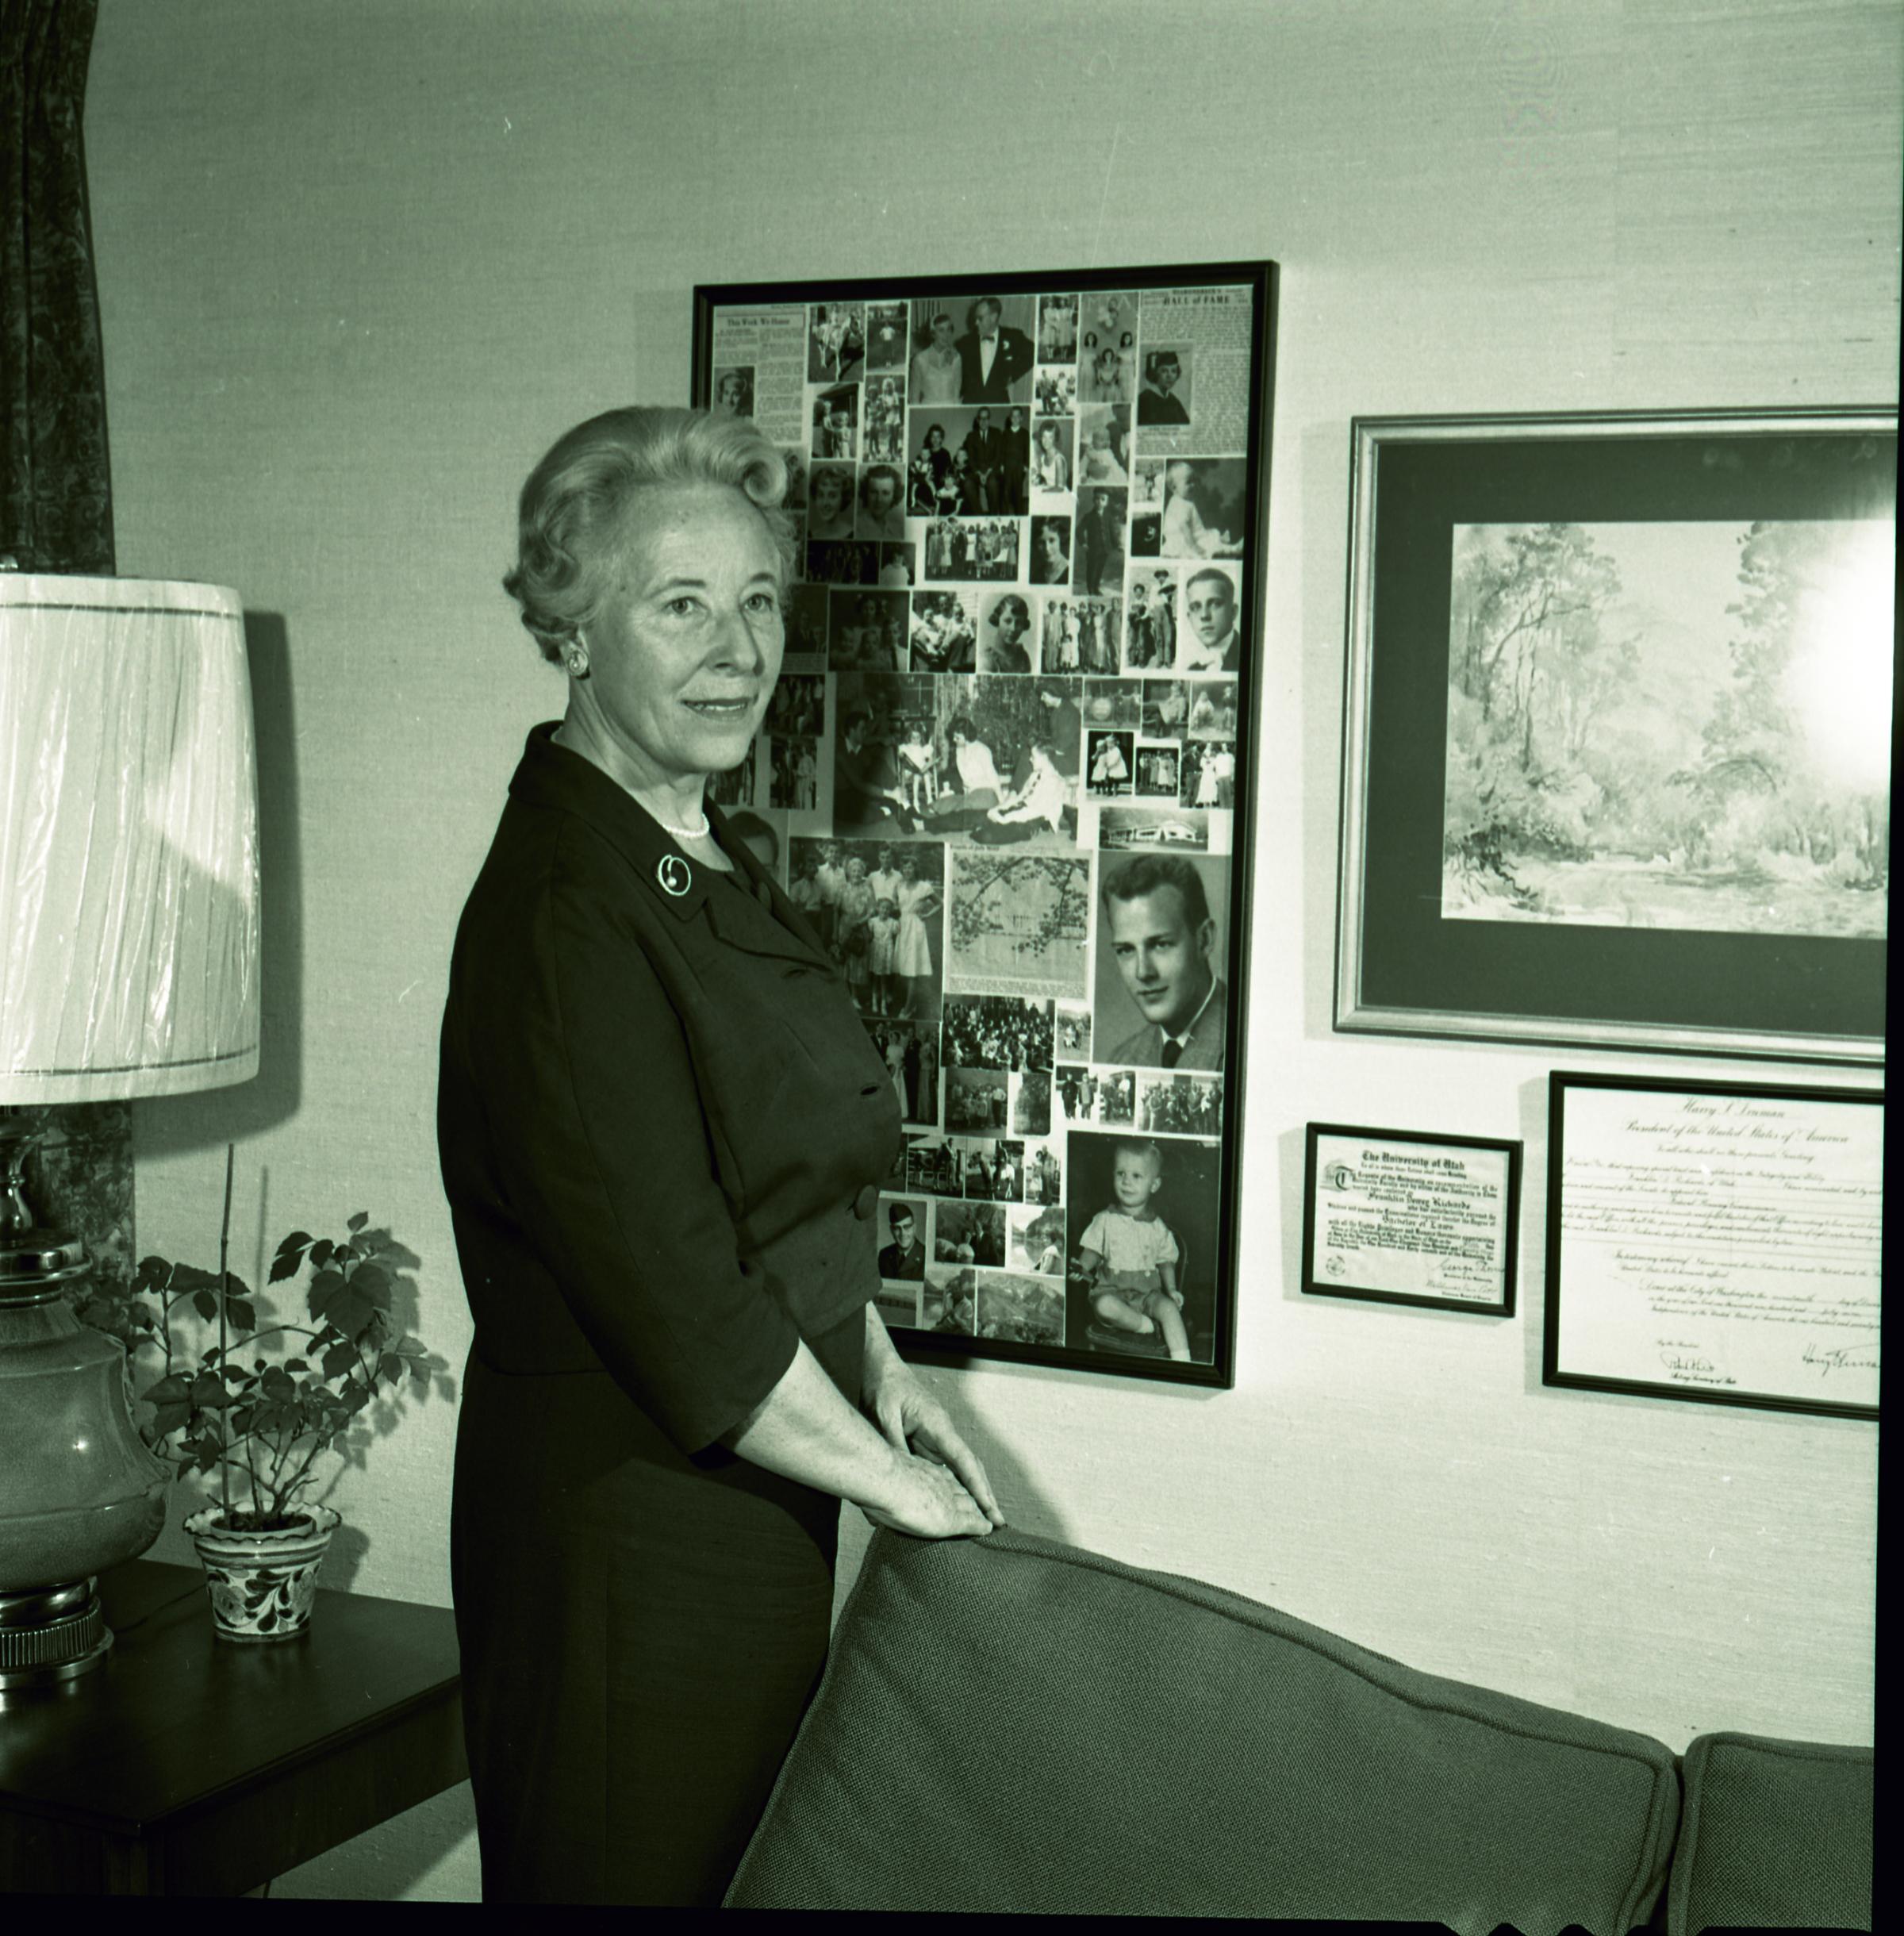 Sister Helen K. Richards, wife of Elder Franklin D. Richards of the Presidency of the Seventy, circa 1964.